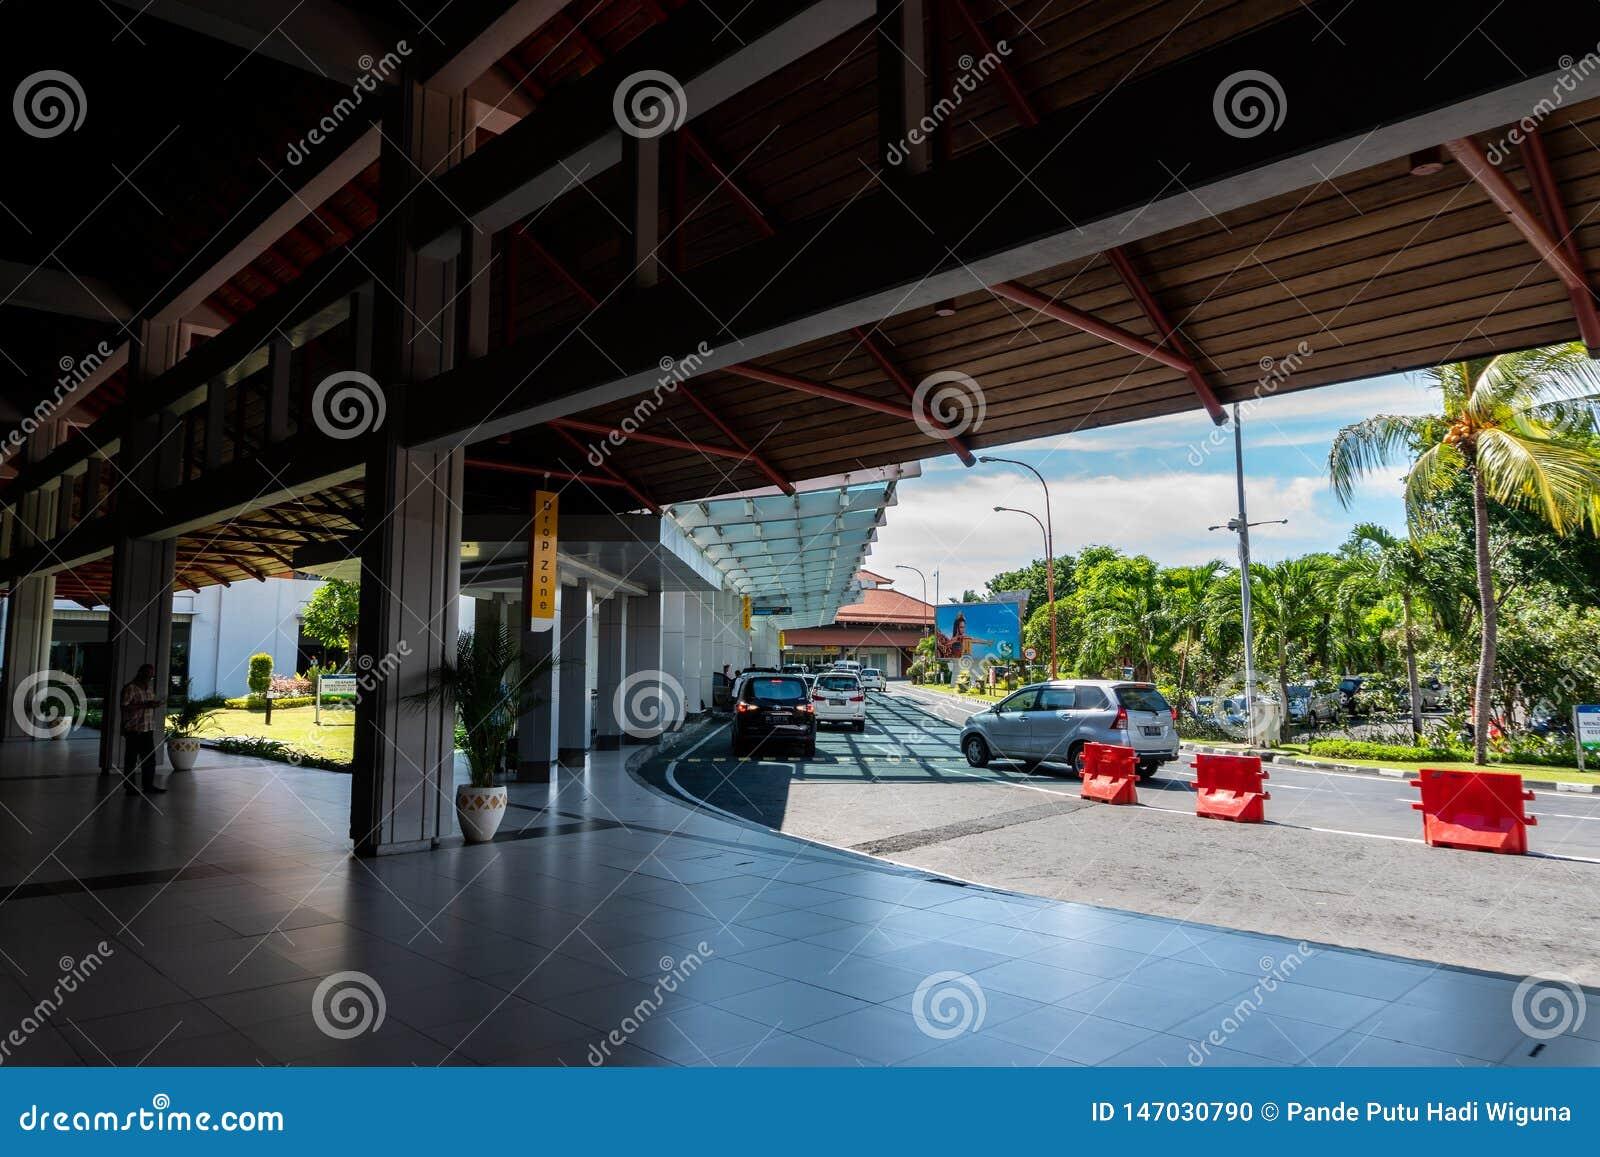 BADUNG/BALI- 28 ΜΑΡΤΊΟΥ 2019: Μια θέση για να ρίξει τους εσωτερικούς επιβάτες στο διεθνή αερολιμένα Ngurah Rai